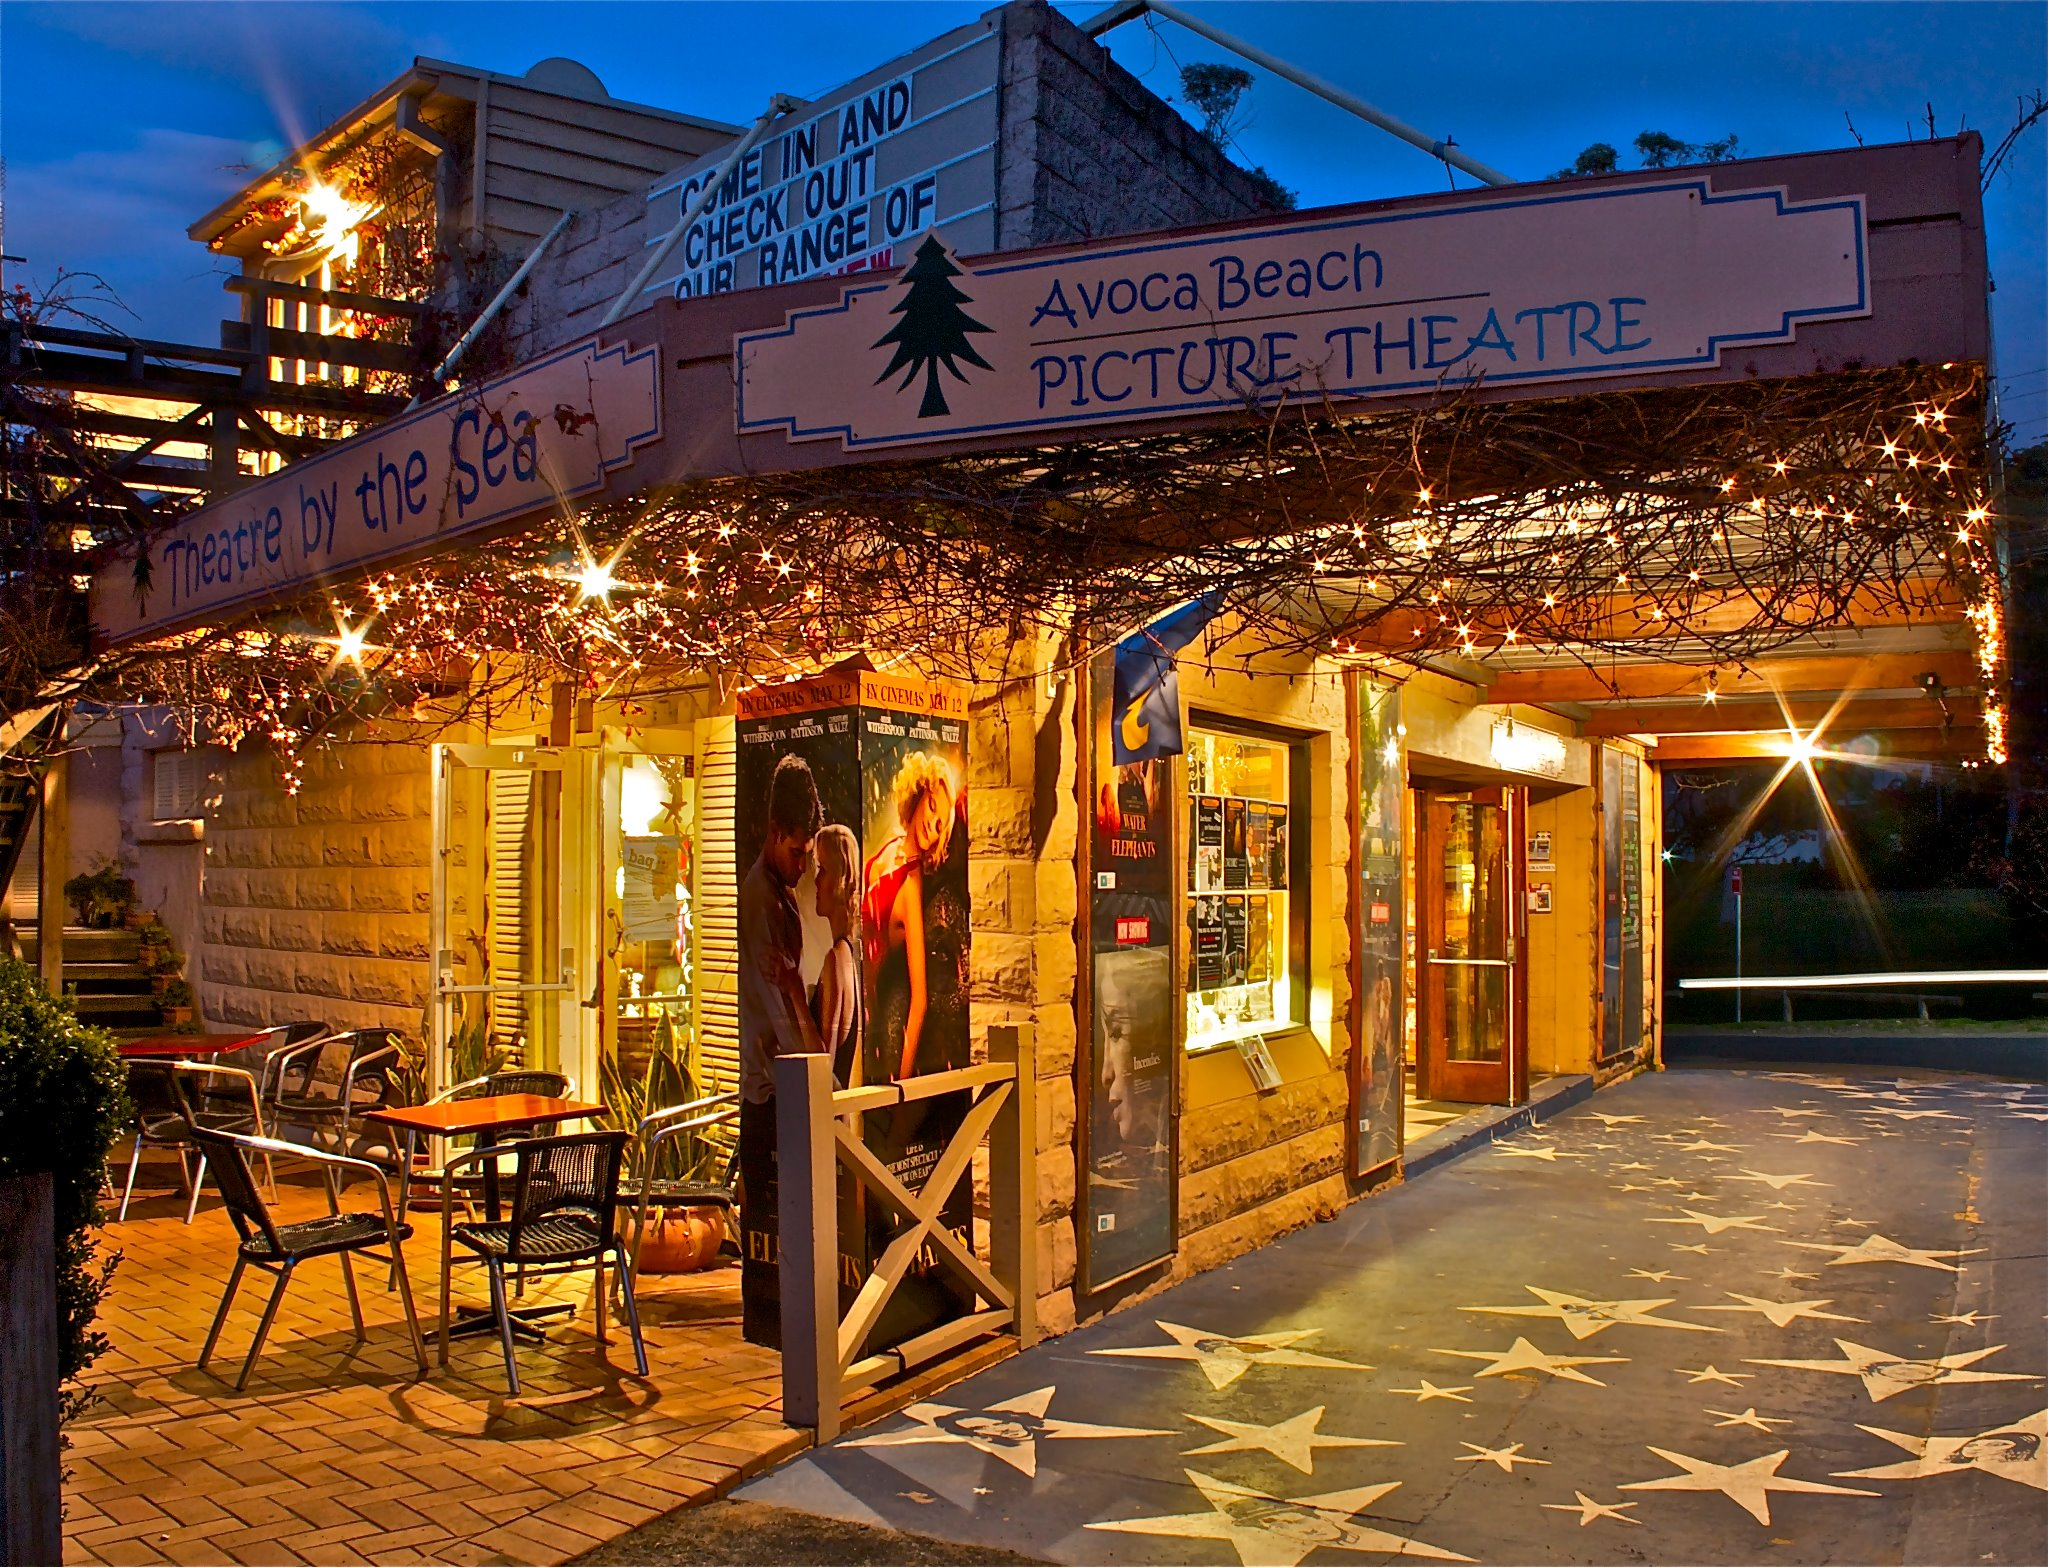 Starry Night Theatre Picture Avoca